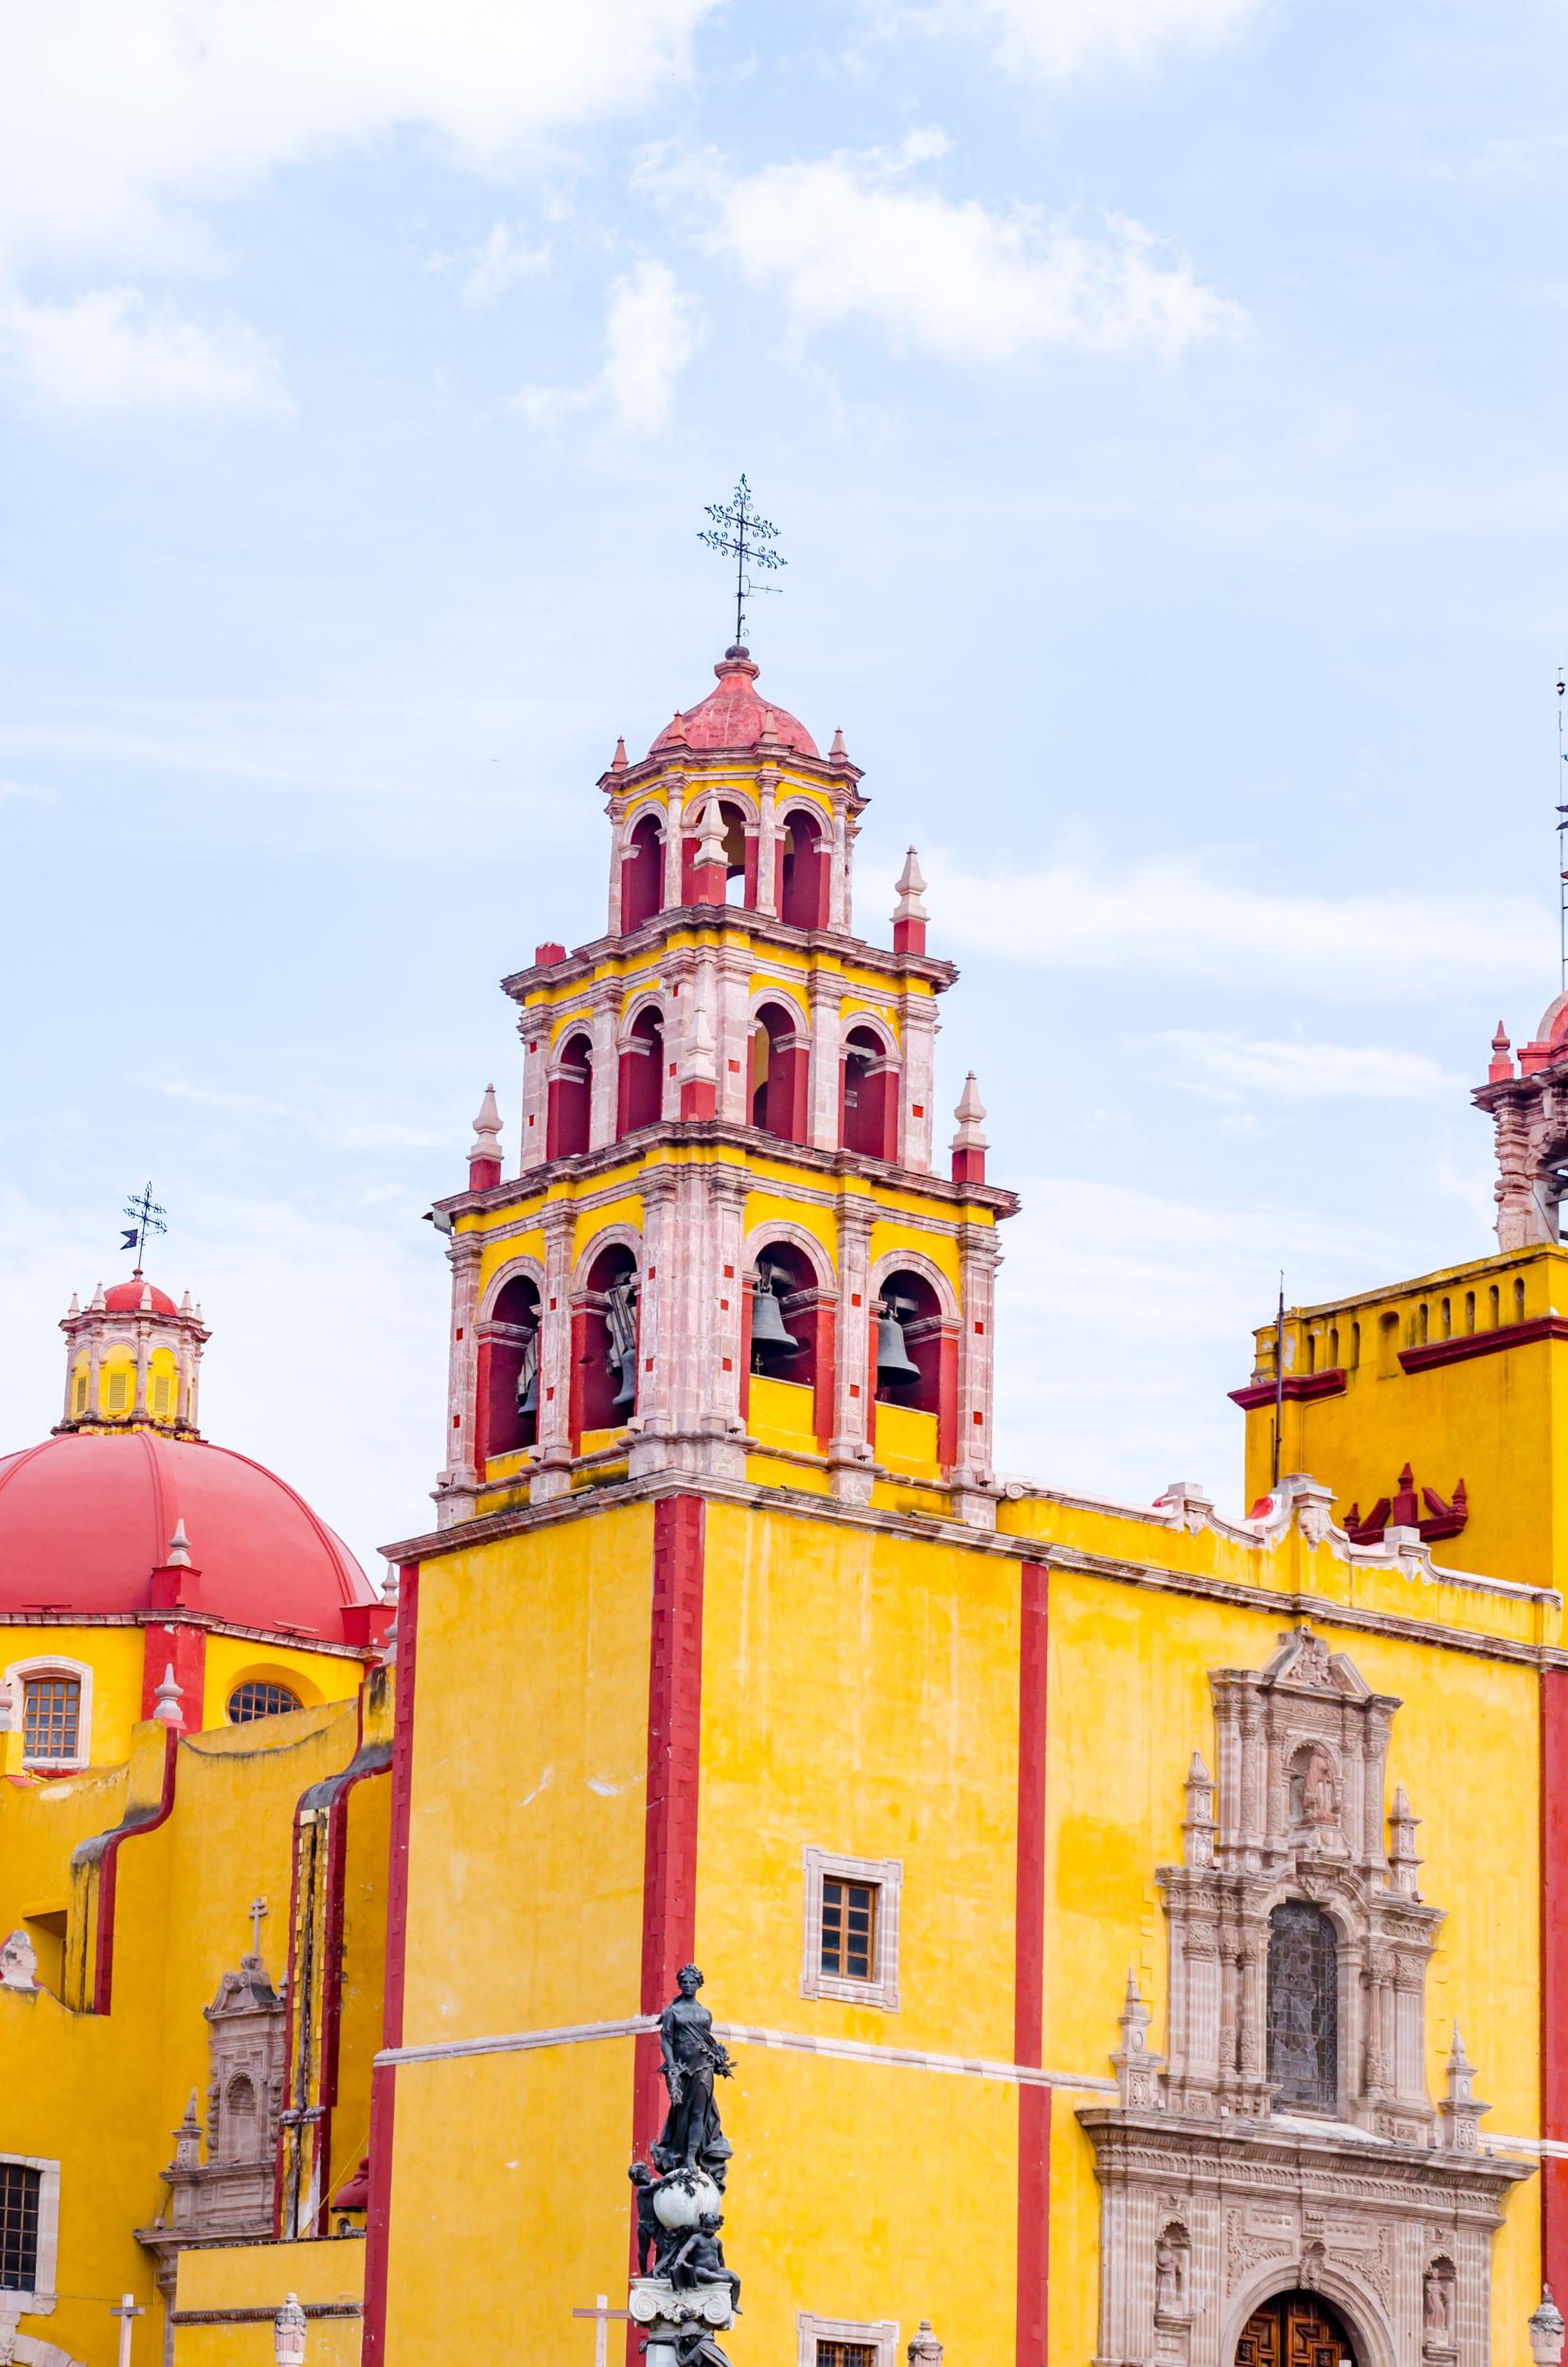 Images of Guanajuato - Nadine Burzler (94 of 175).jpg